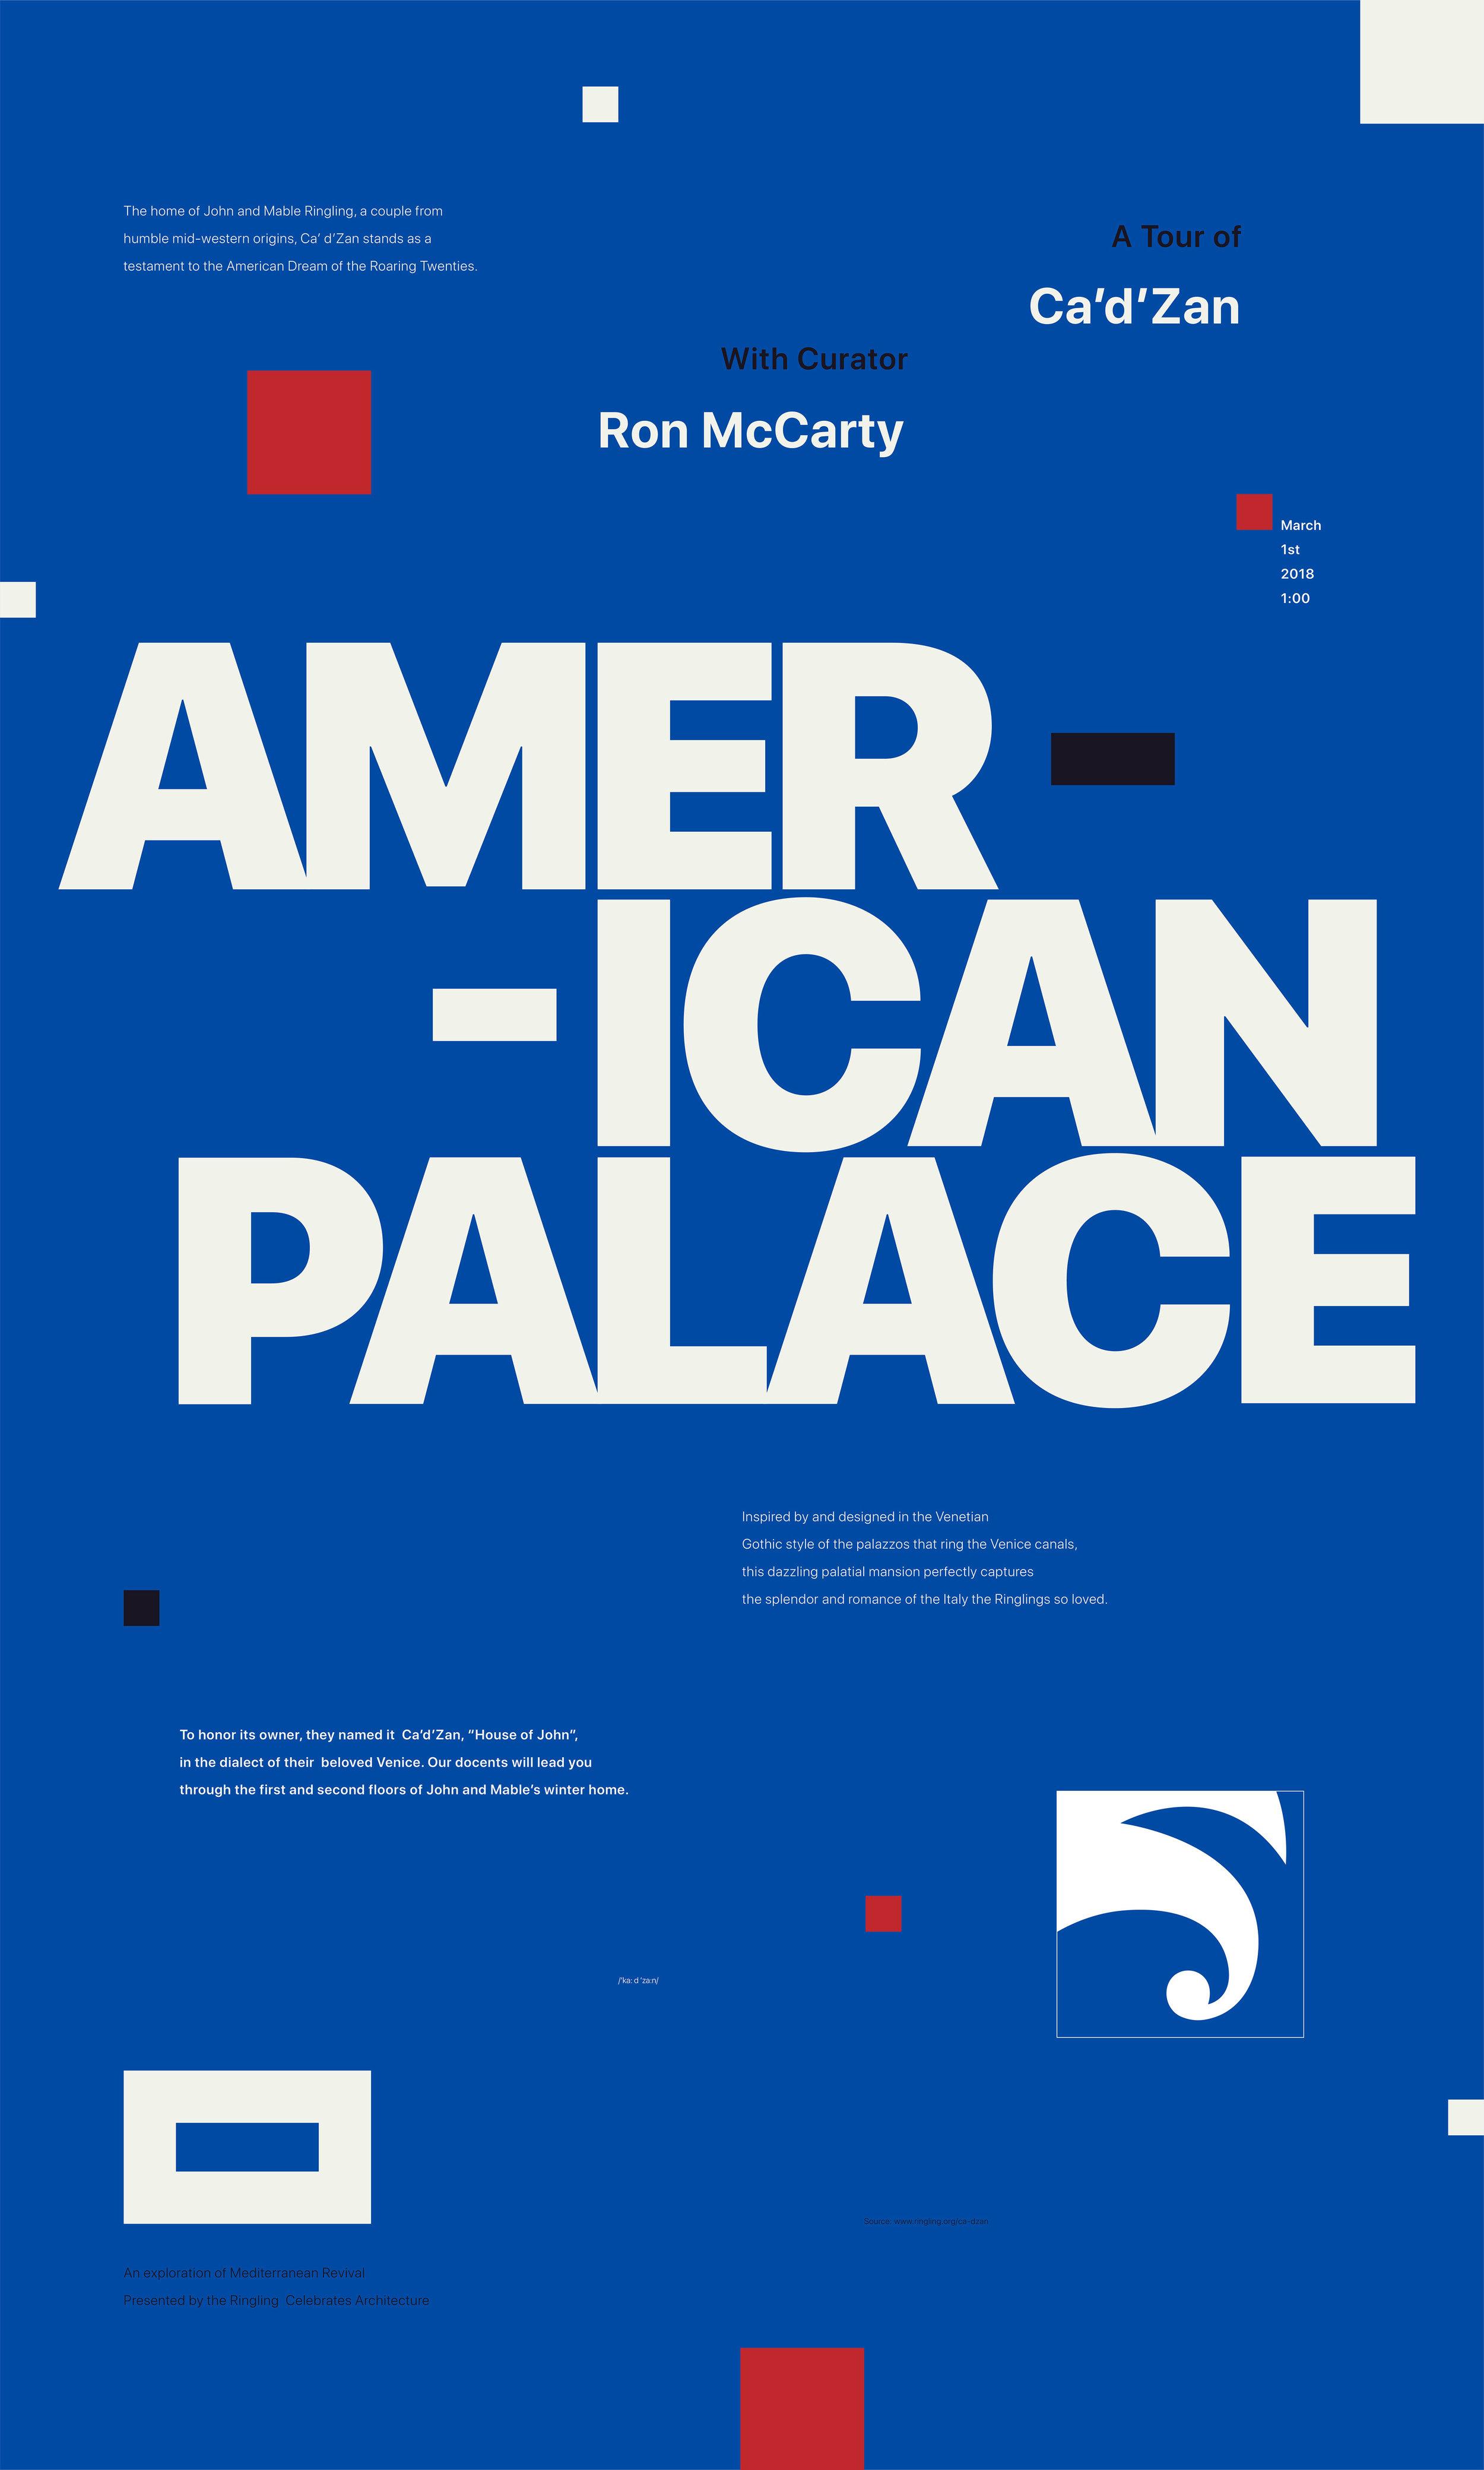 AmericanPalace.jpg